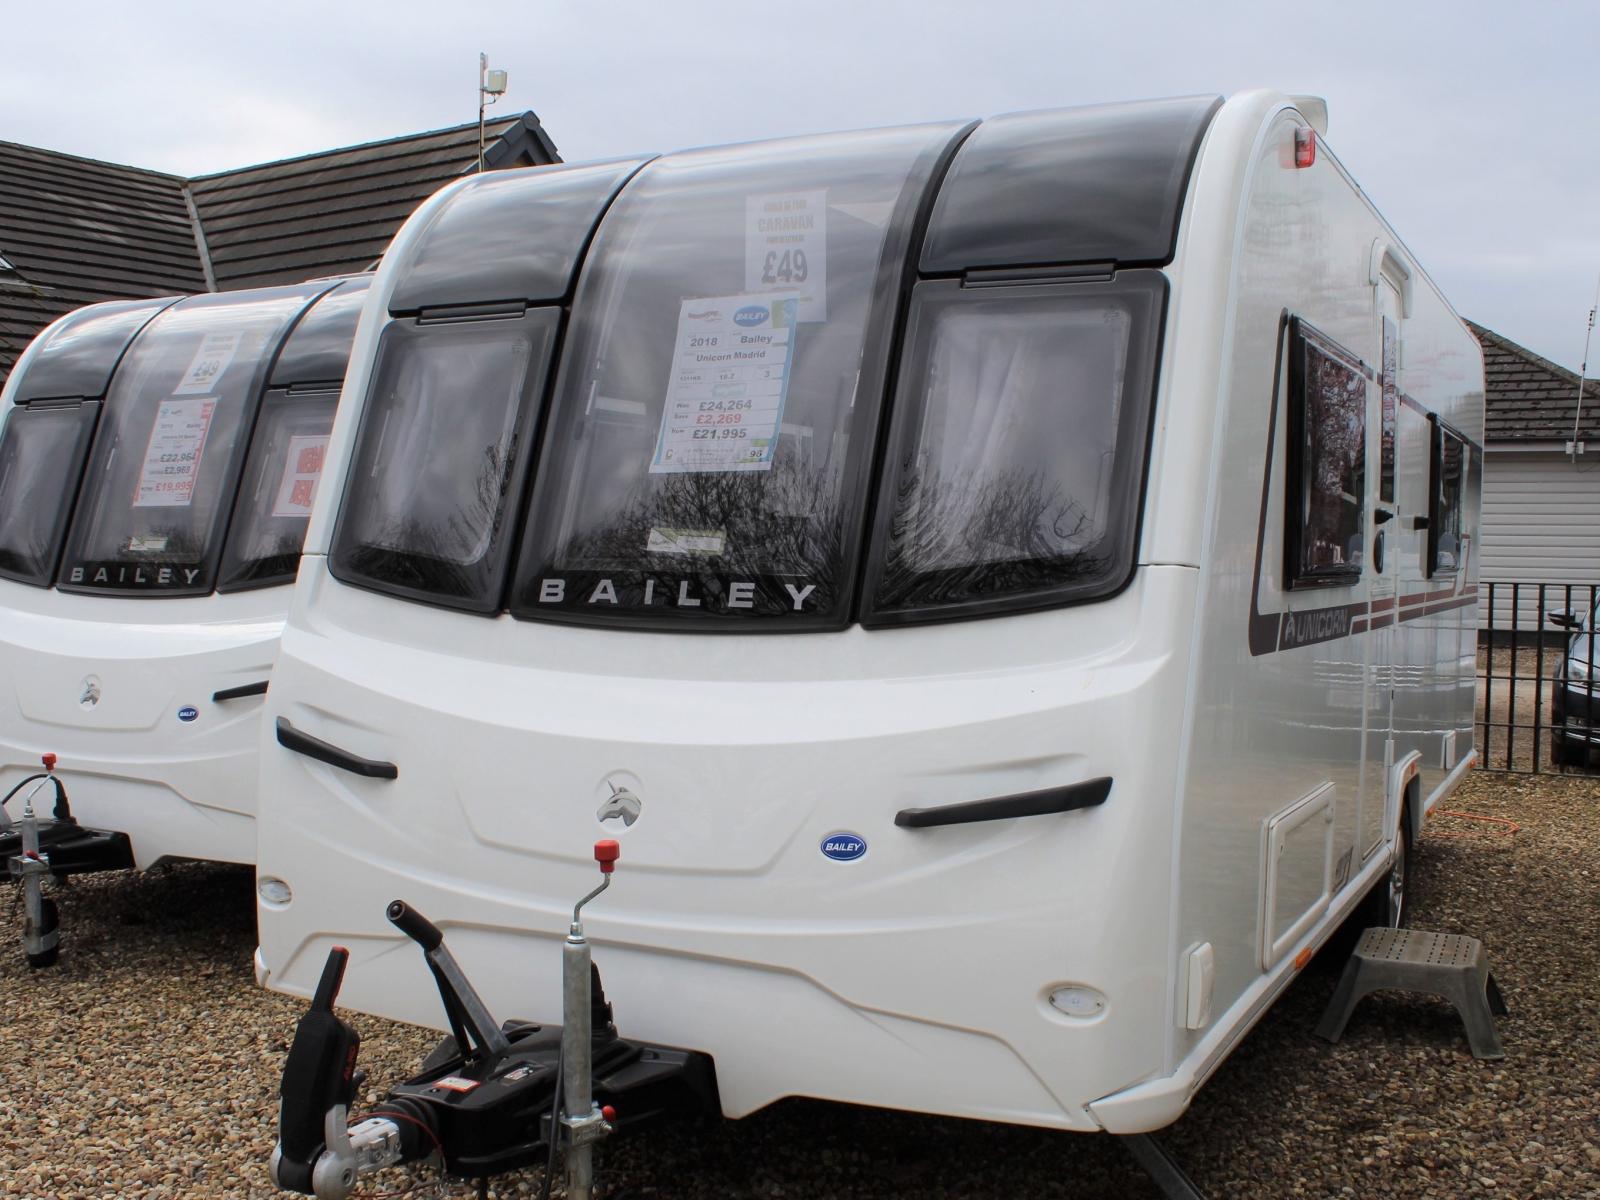 Bailey Unicorn Madrid 2018 New Caravans | Wandahome (South